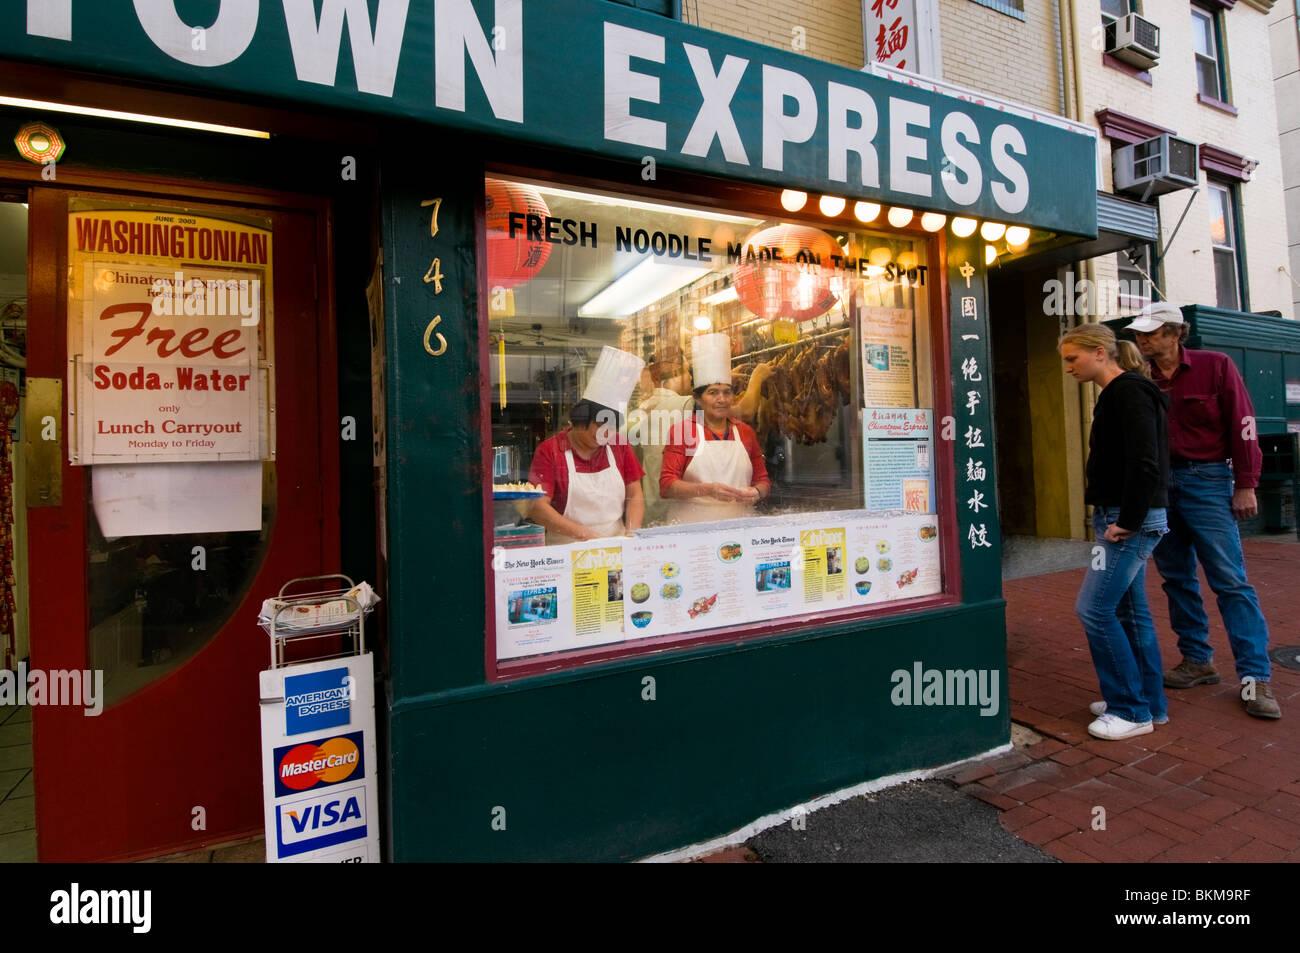 The Chinatown Express Restaurant In Washington Dc Stock